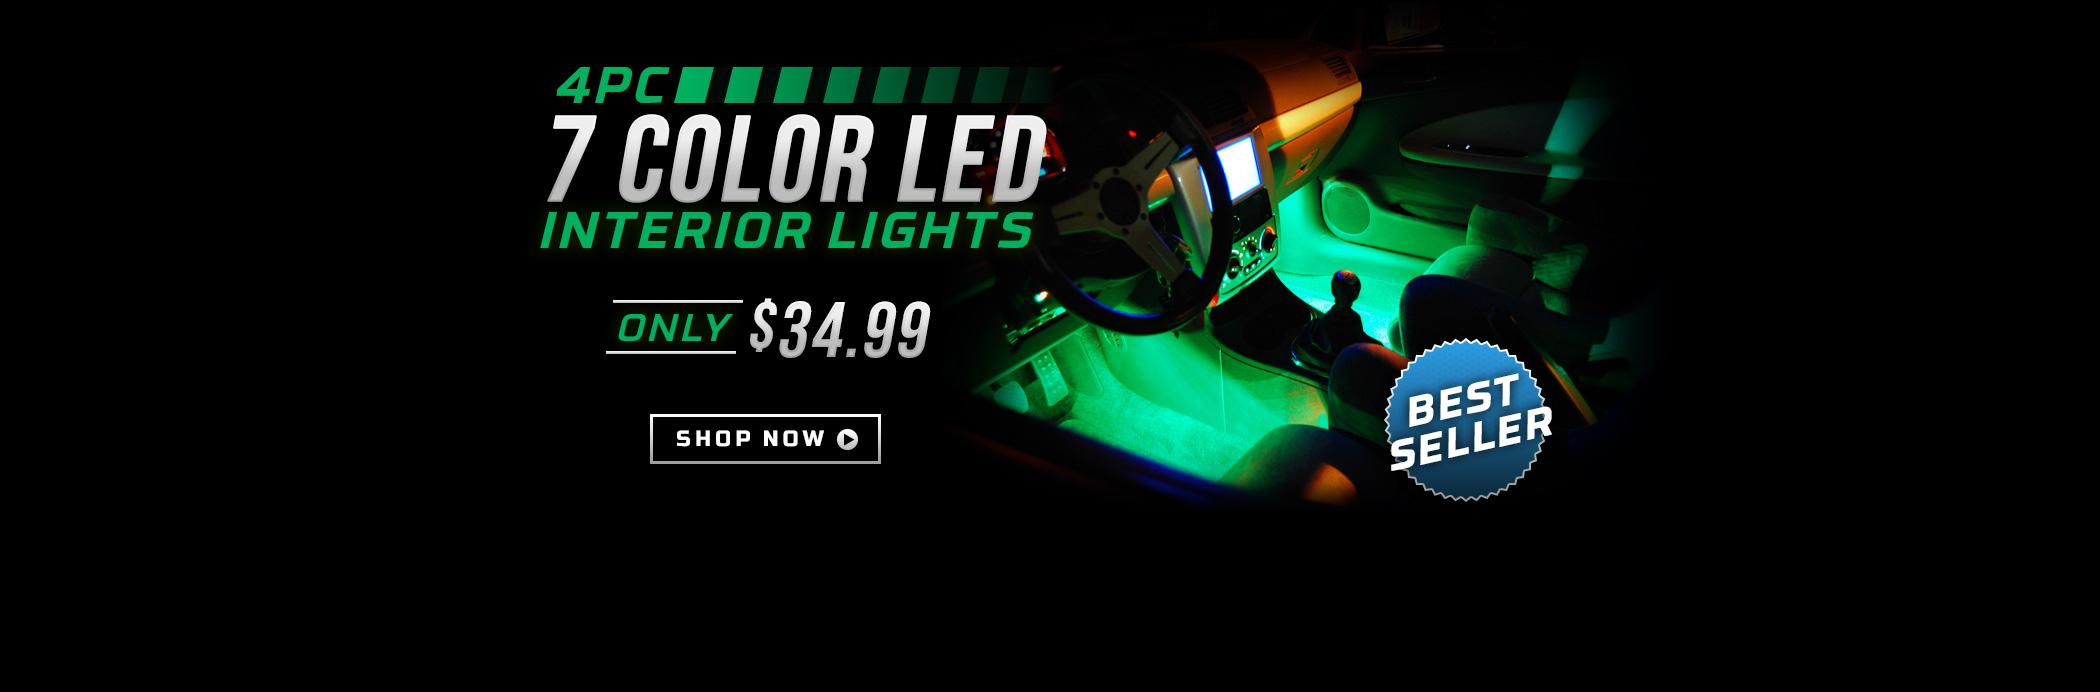 4pc 7 Color LED Interior Lights